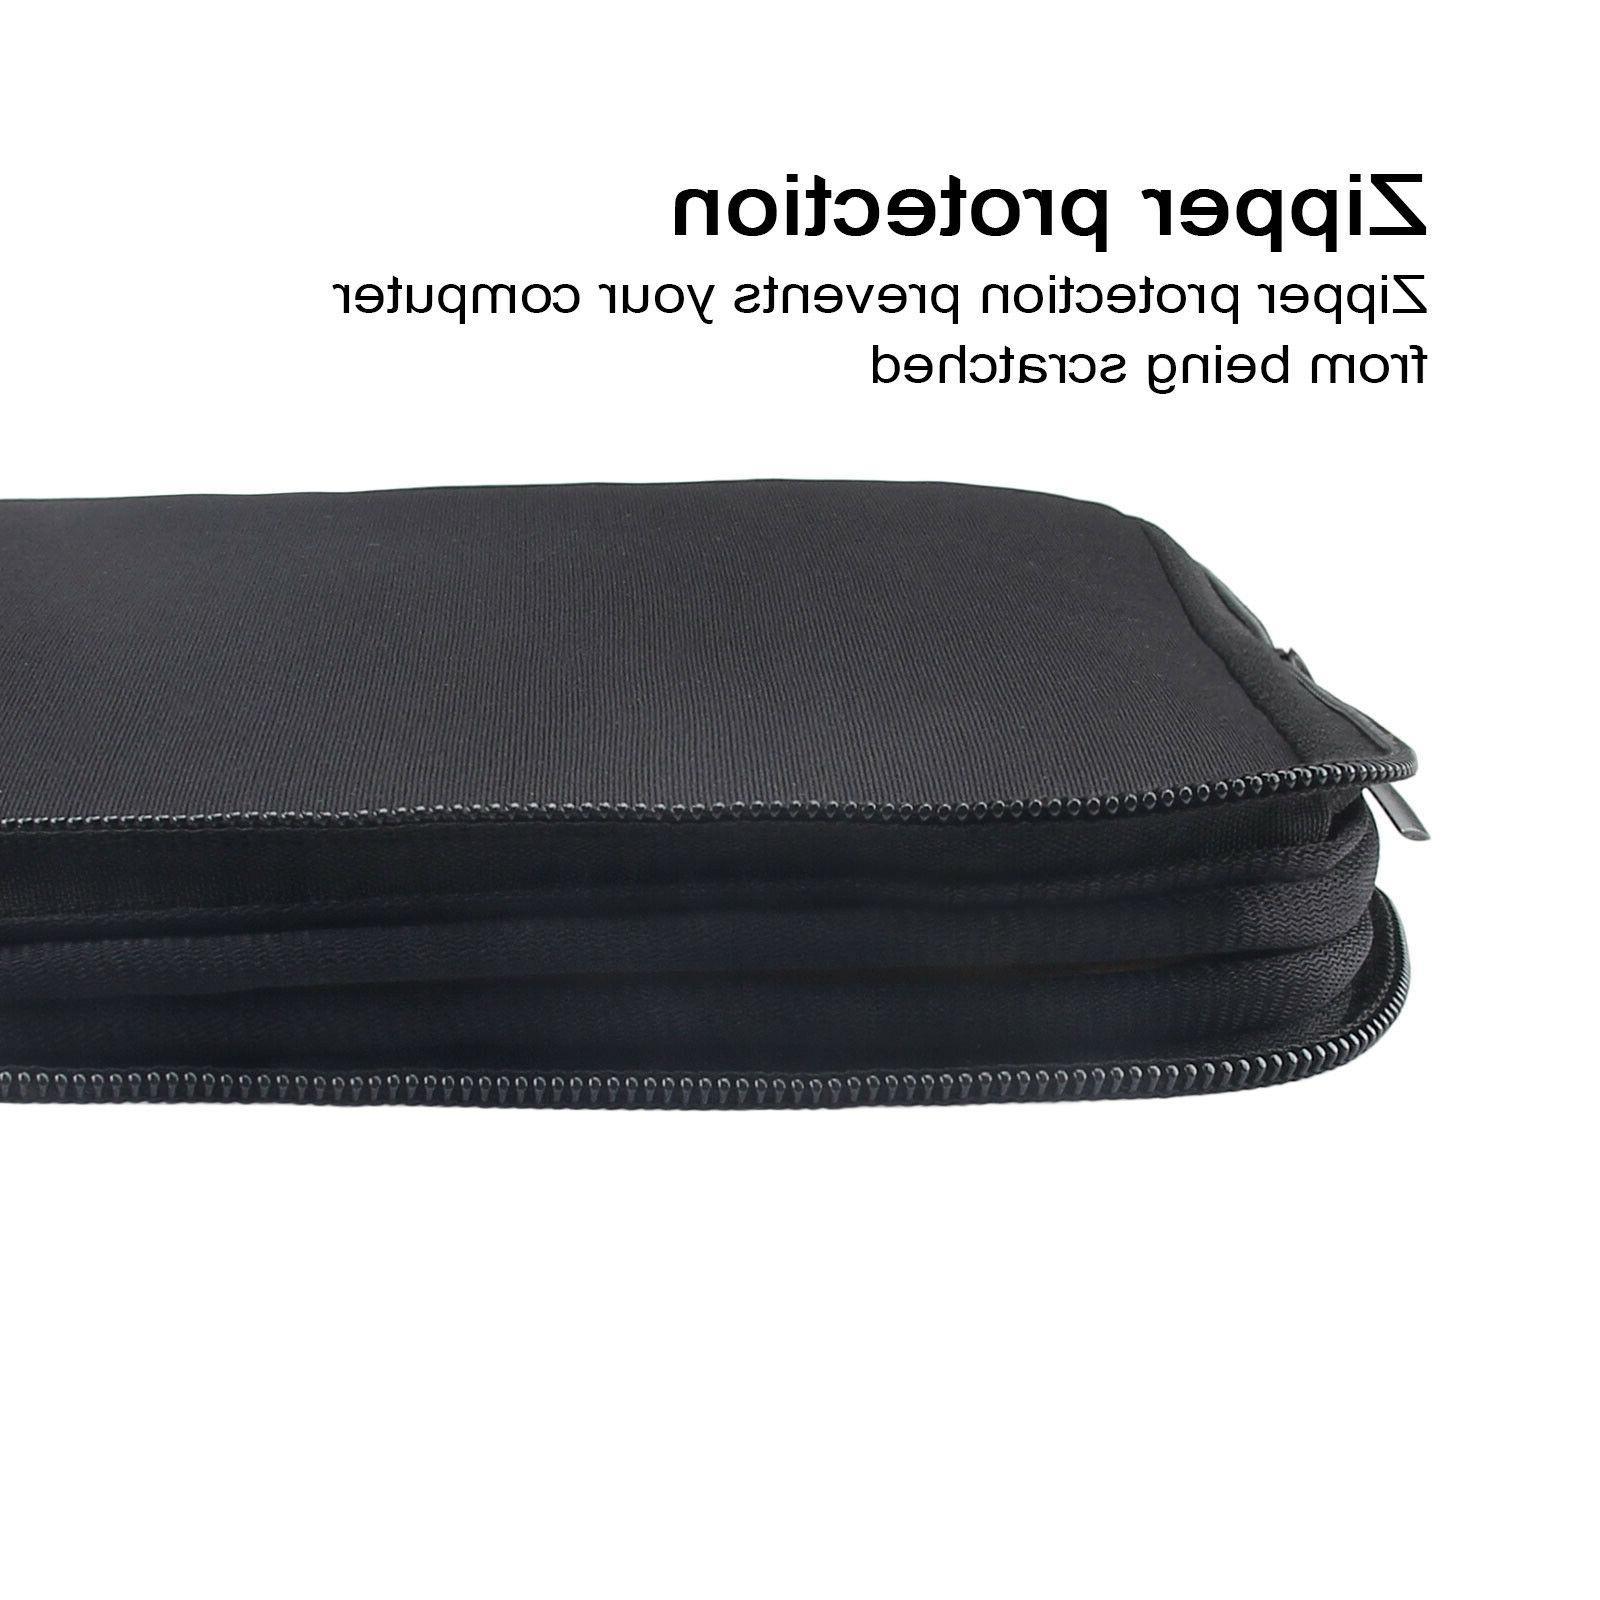 "Black 15.6"" Laptop Sleeve Bag Notebook Case For HP Lenovo ASUS"